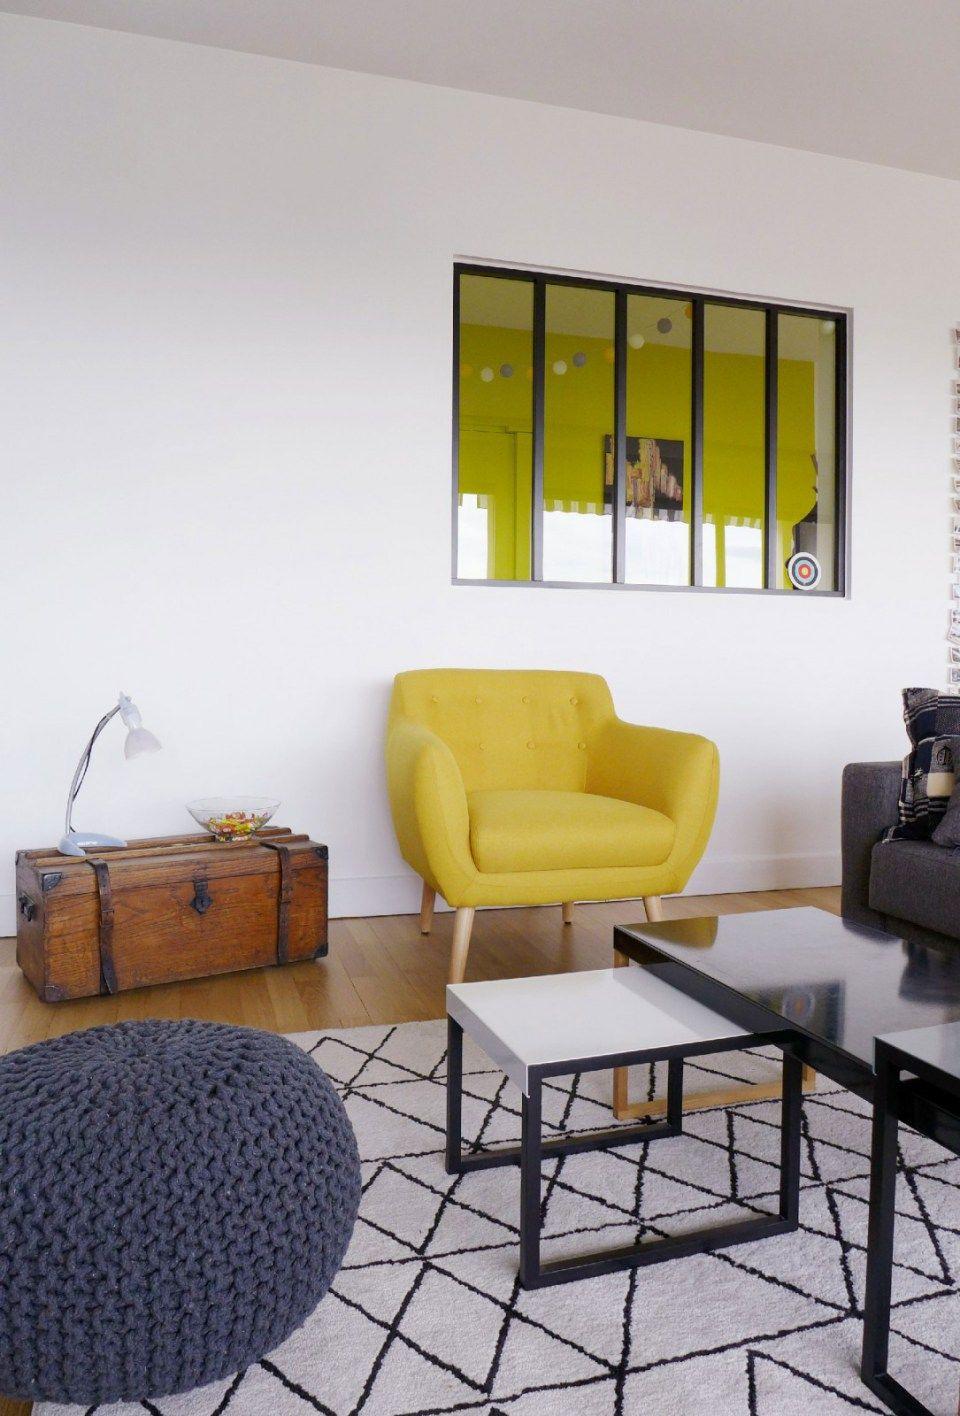 Skea Designer Polychrome Decoration Salon Appartement Decoration Salon Jaune Decoration Maison